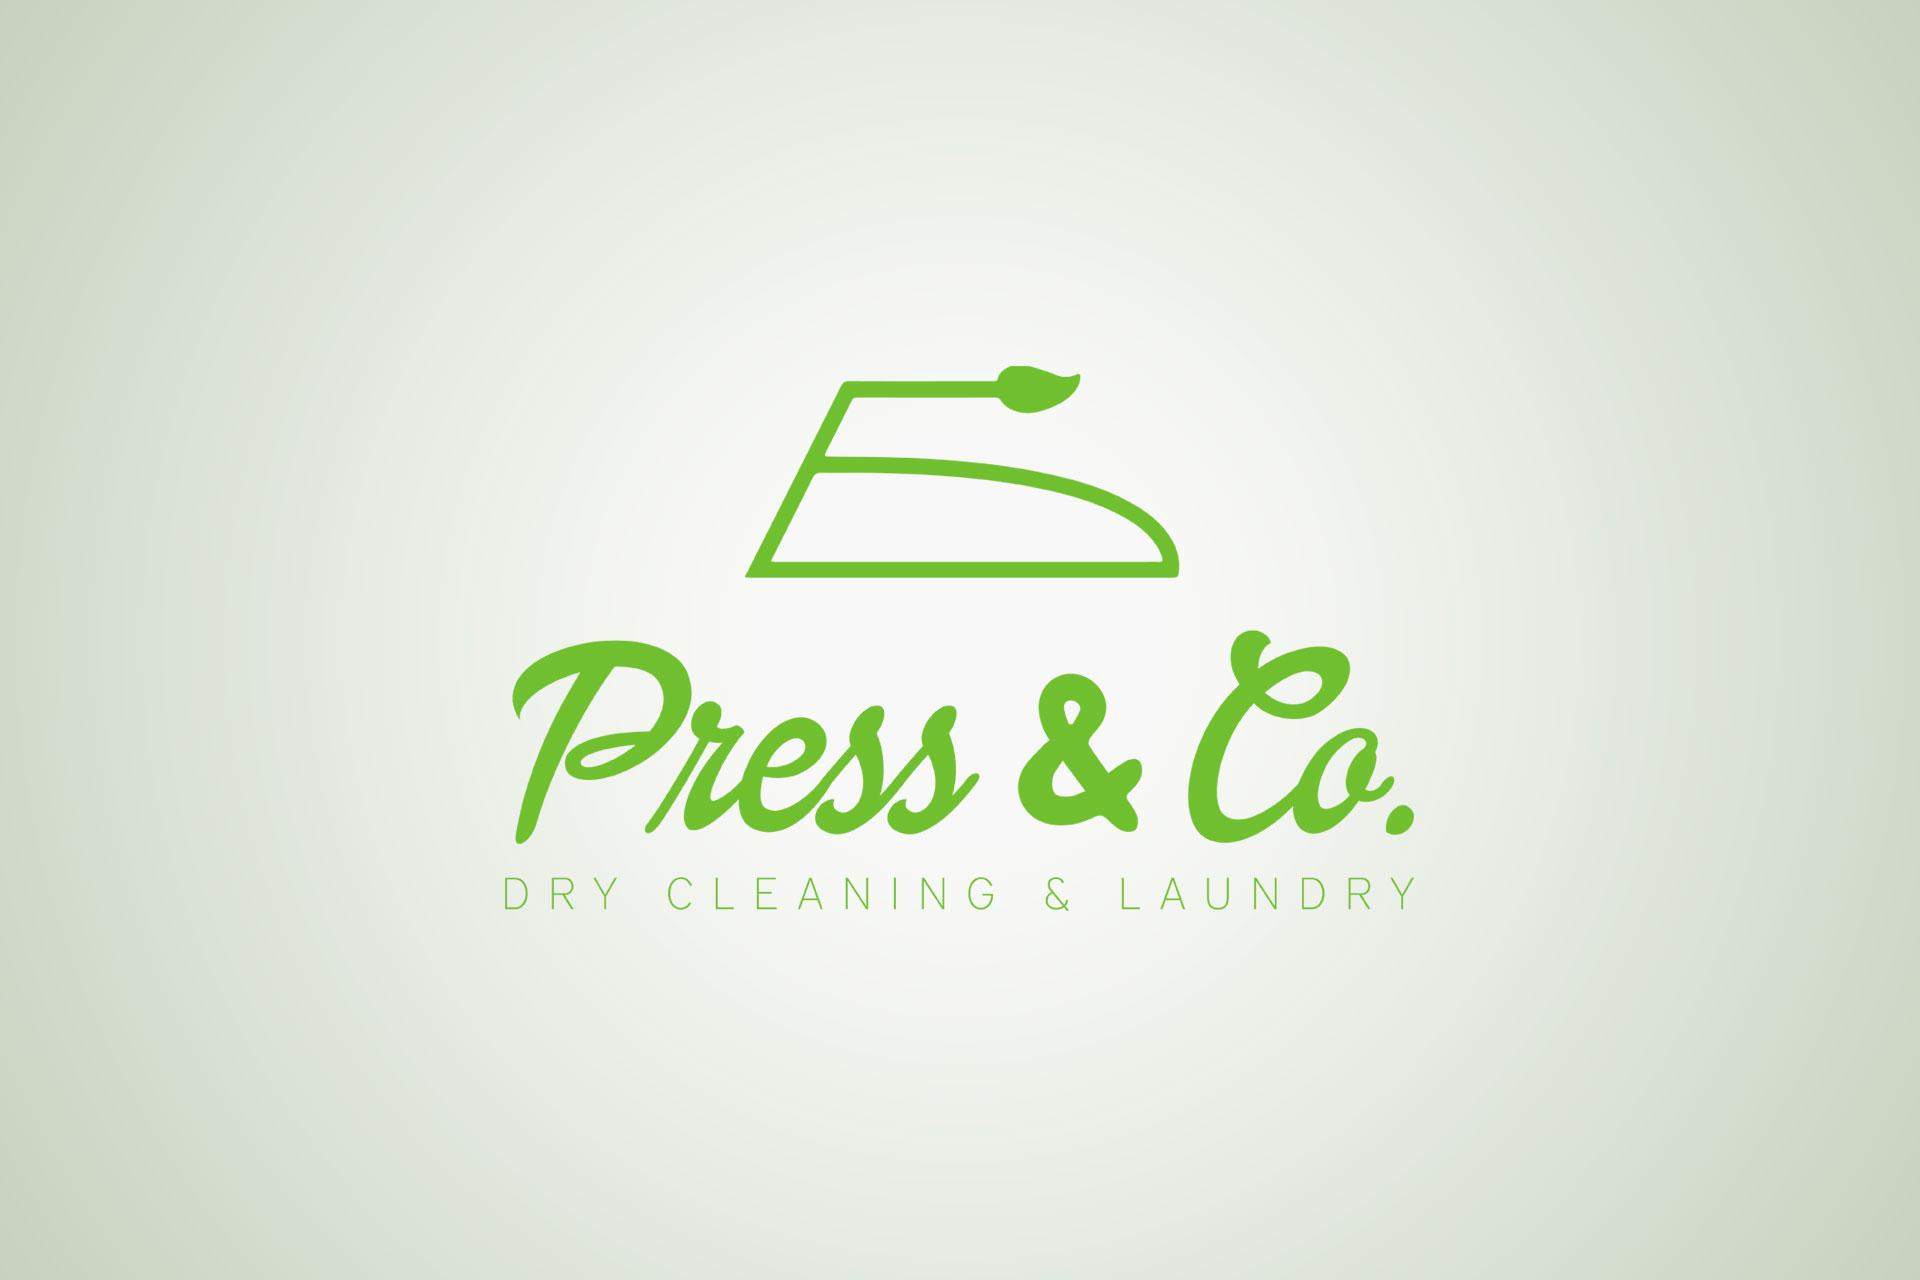 pressandco-logo